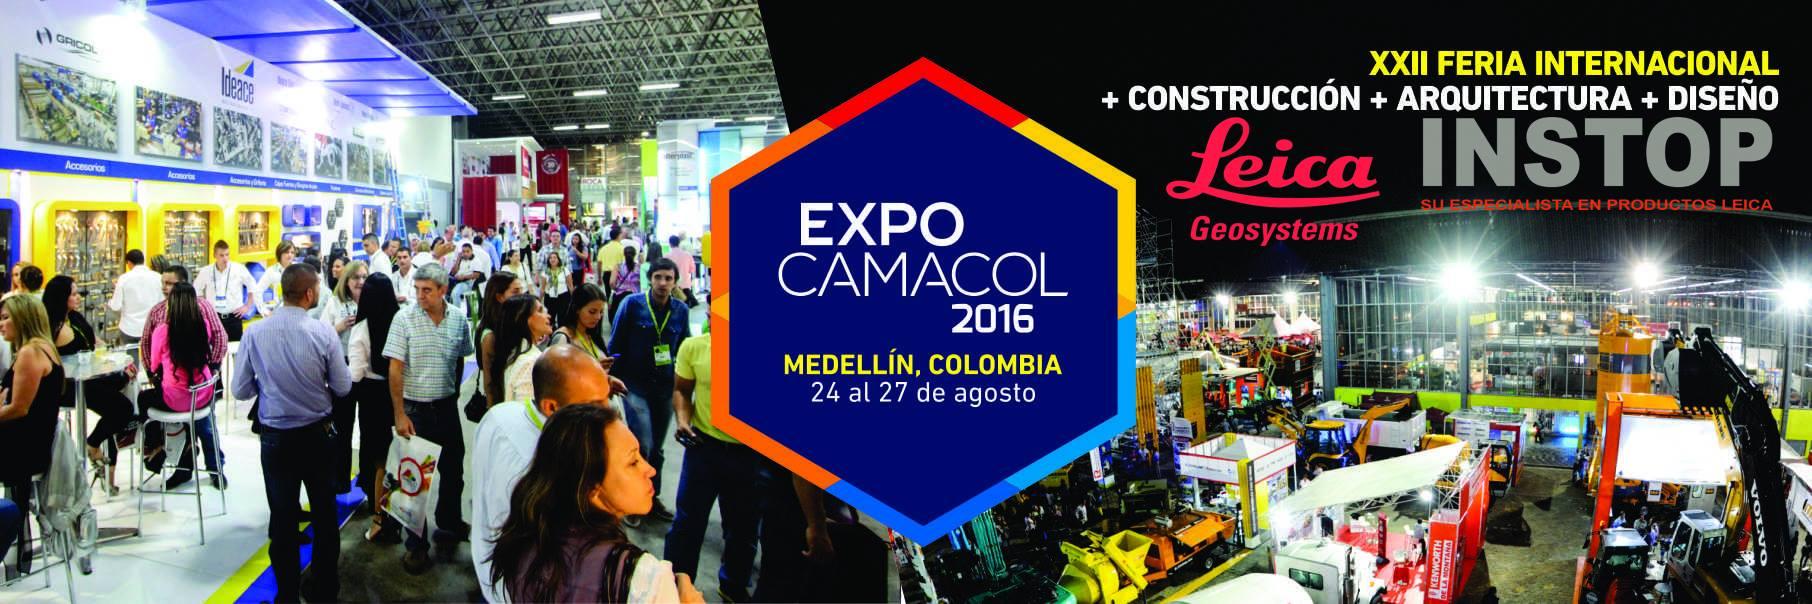 EXPOCAMACOL 2016